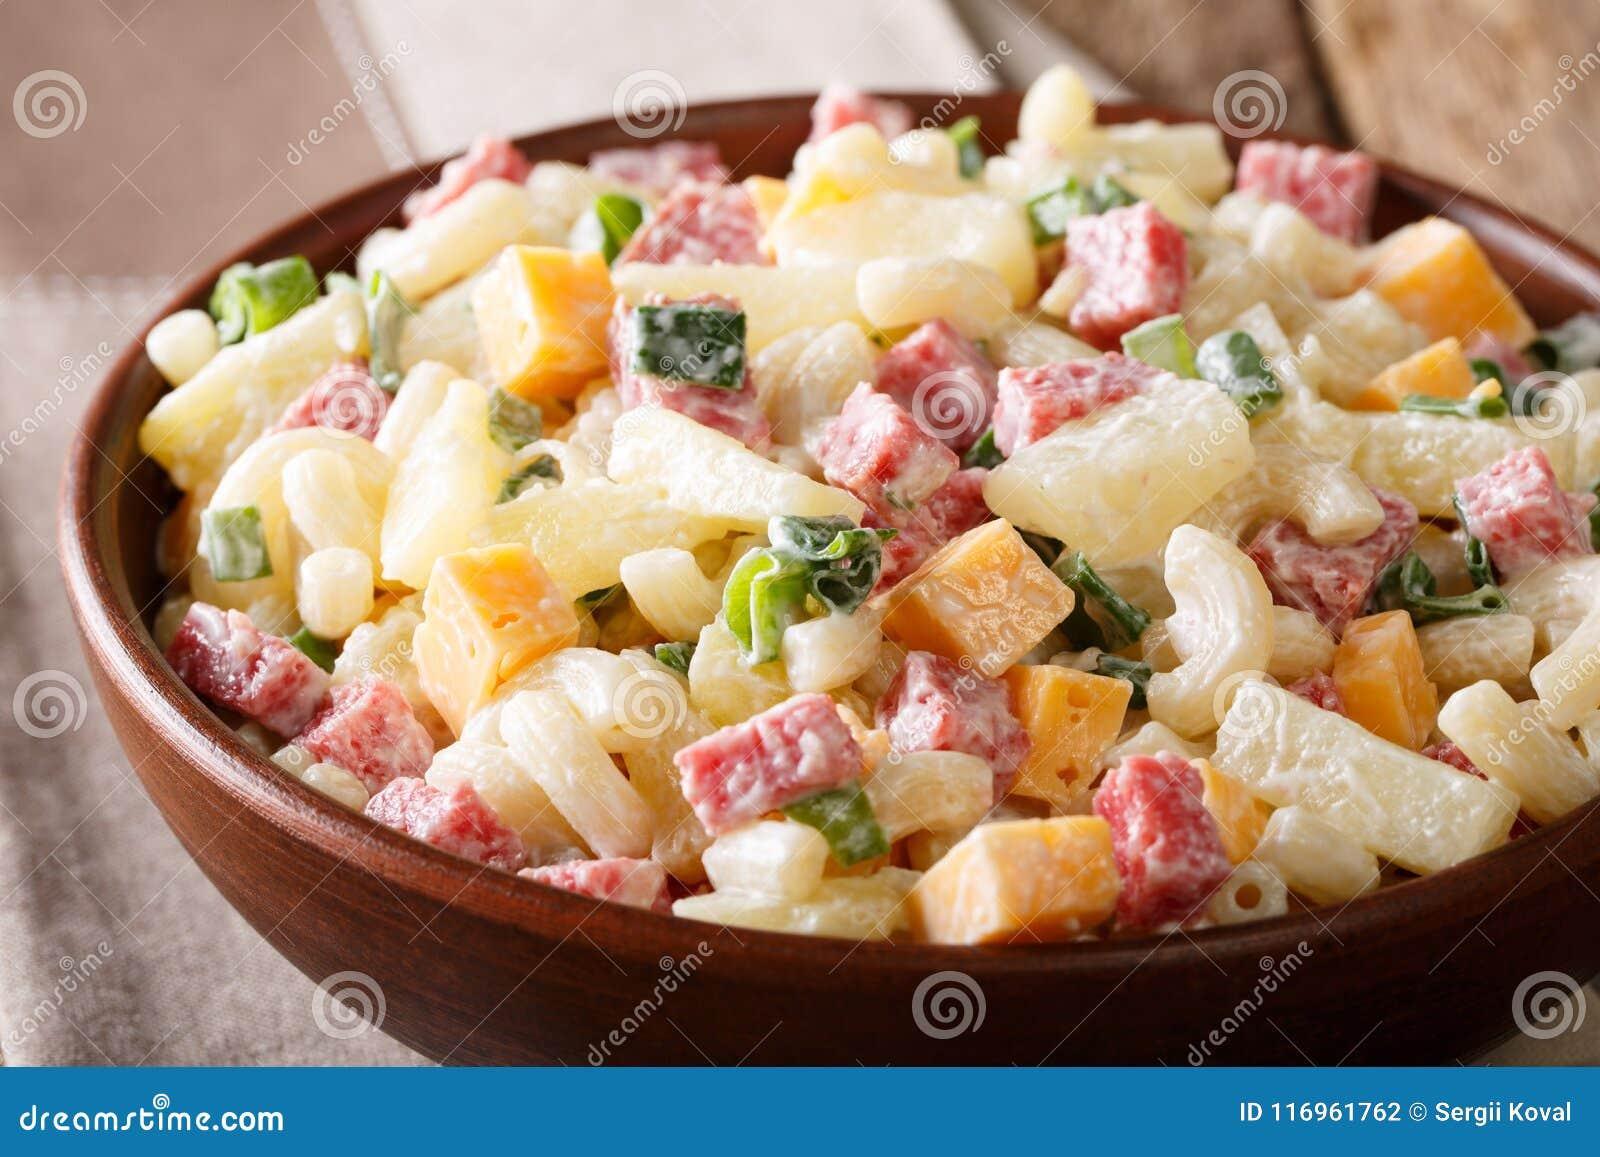 Hearty Hawaiian Salad With Pasta Ham Pineapple Onion Cheddar